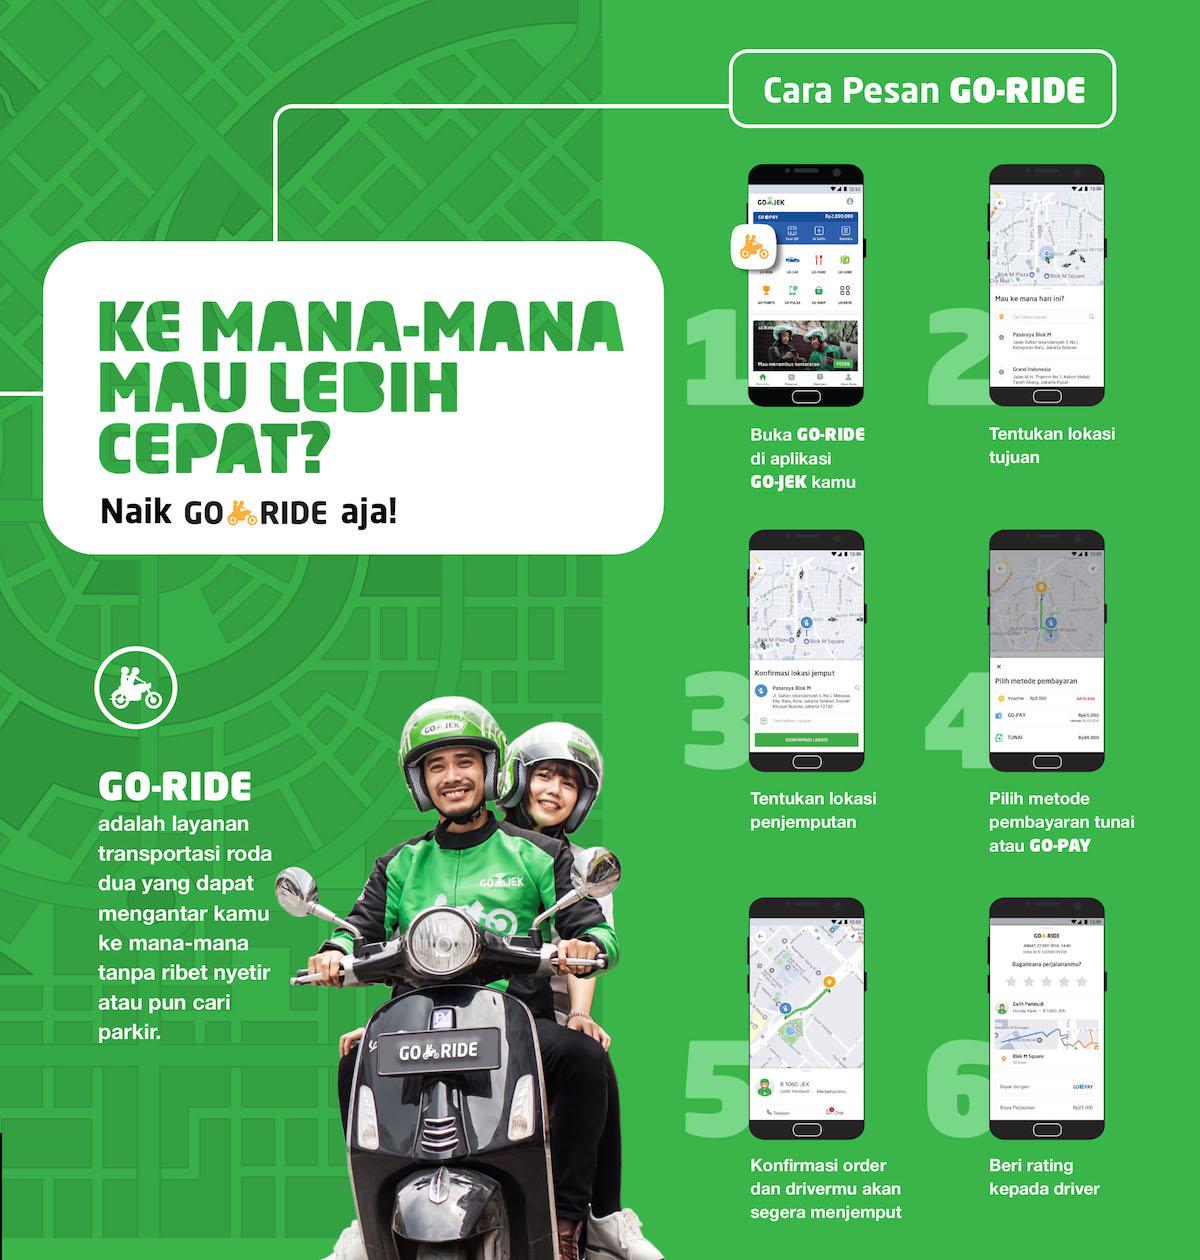 Cara Pesan Go Ride Atau Cara Menggunakan Aplikasi Untuk